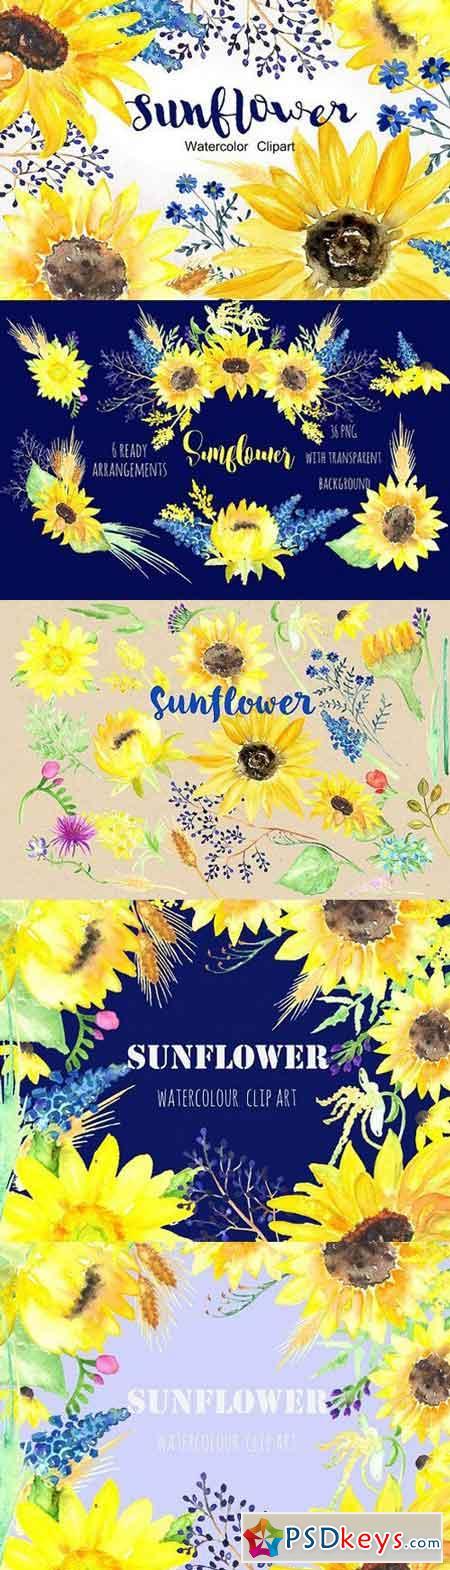 Sunflower Watercolor Clip Art 253219